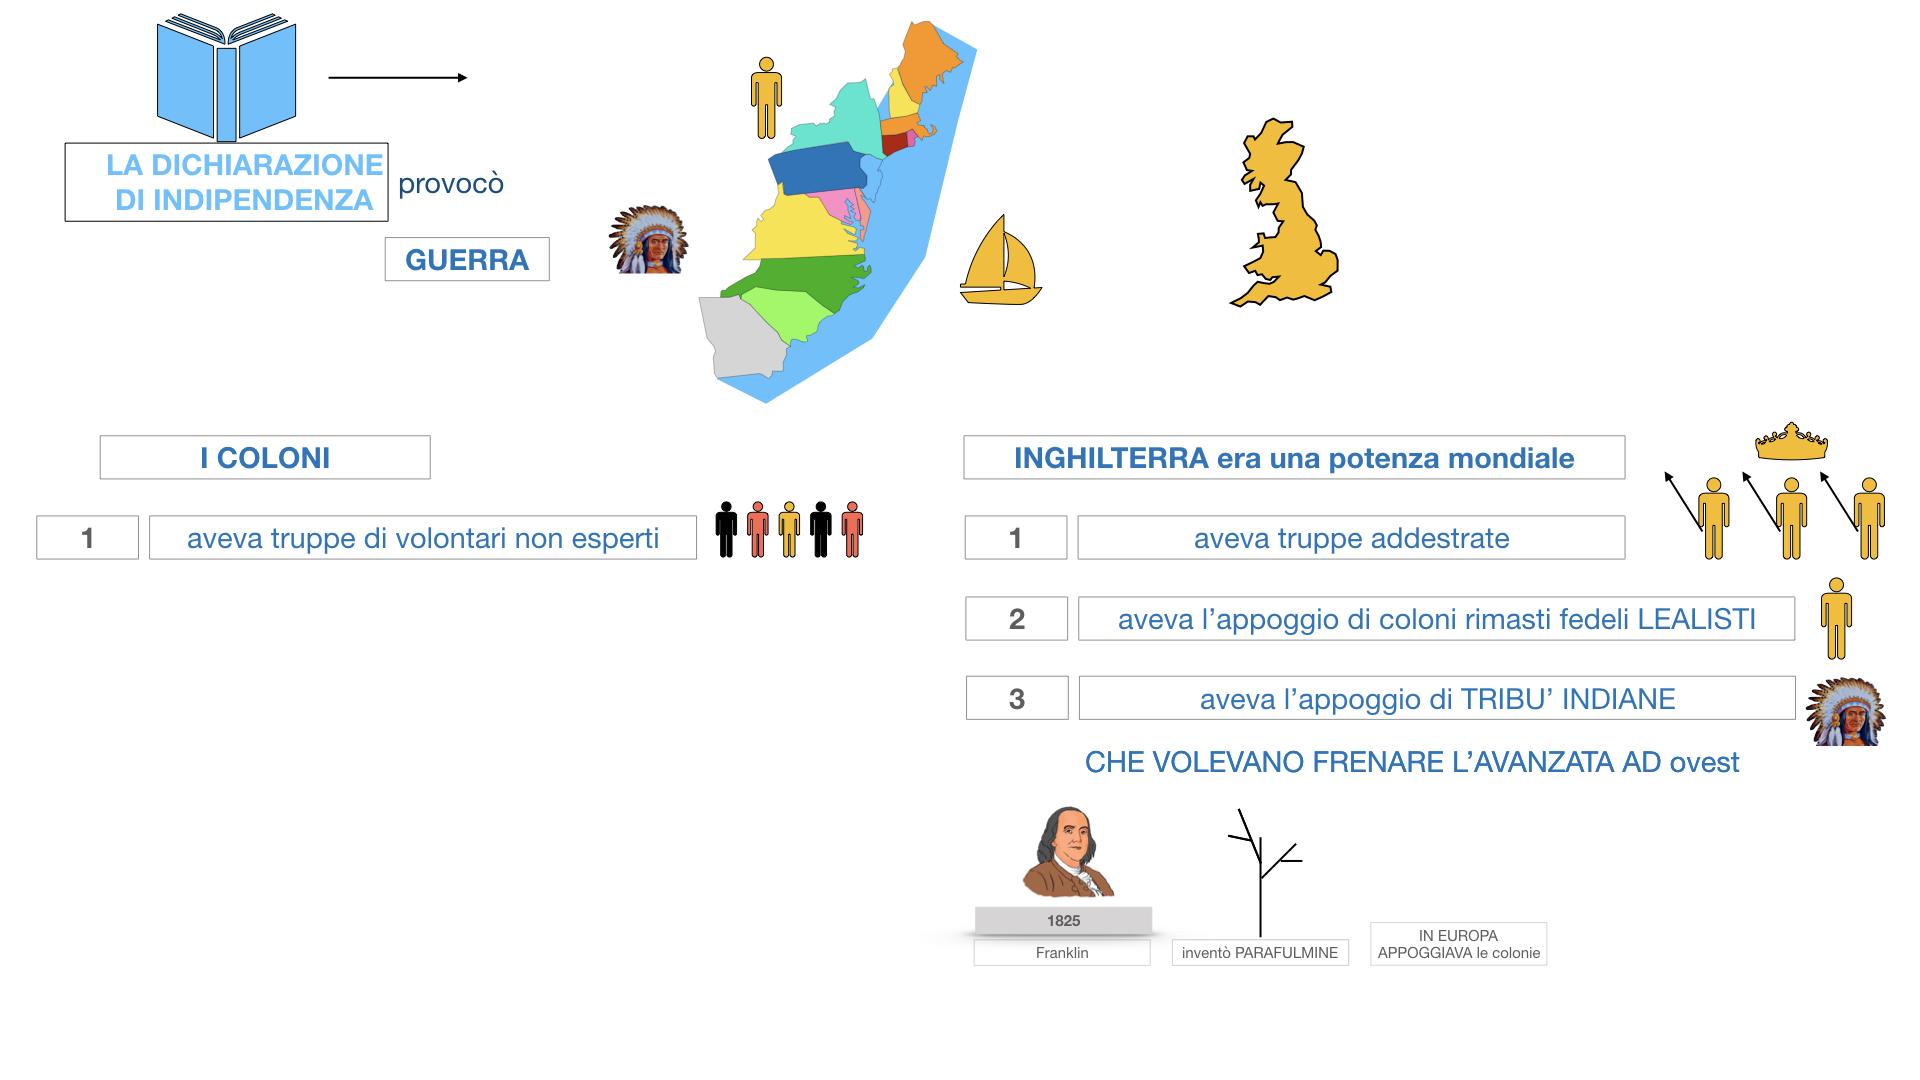 GUERRA DI INDIPENDENZA AMERICANA_SIMULAZIONE.114